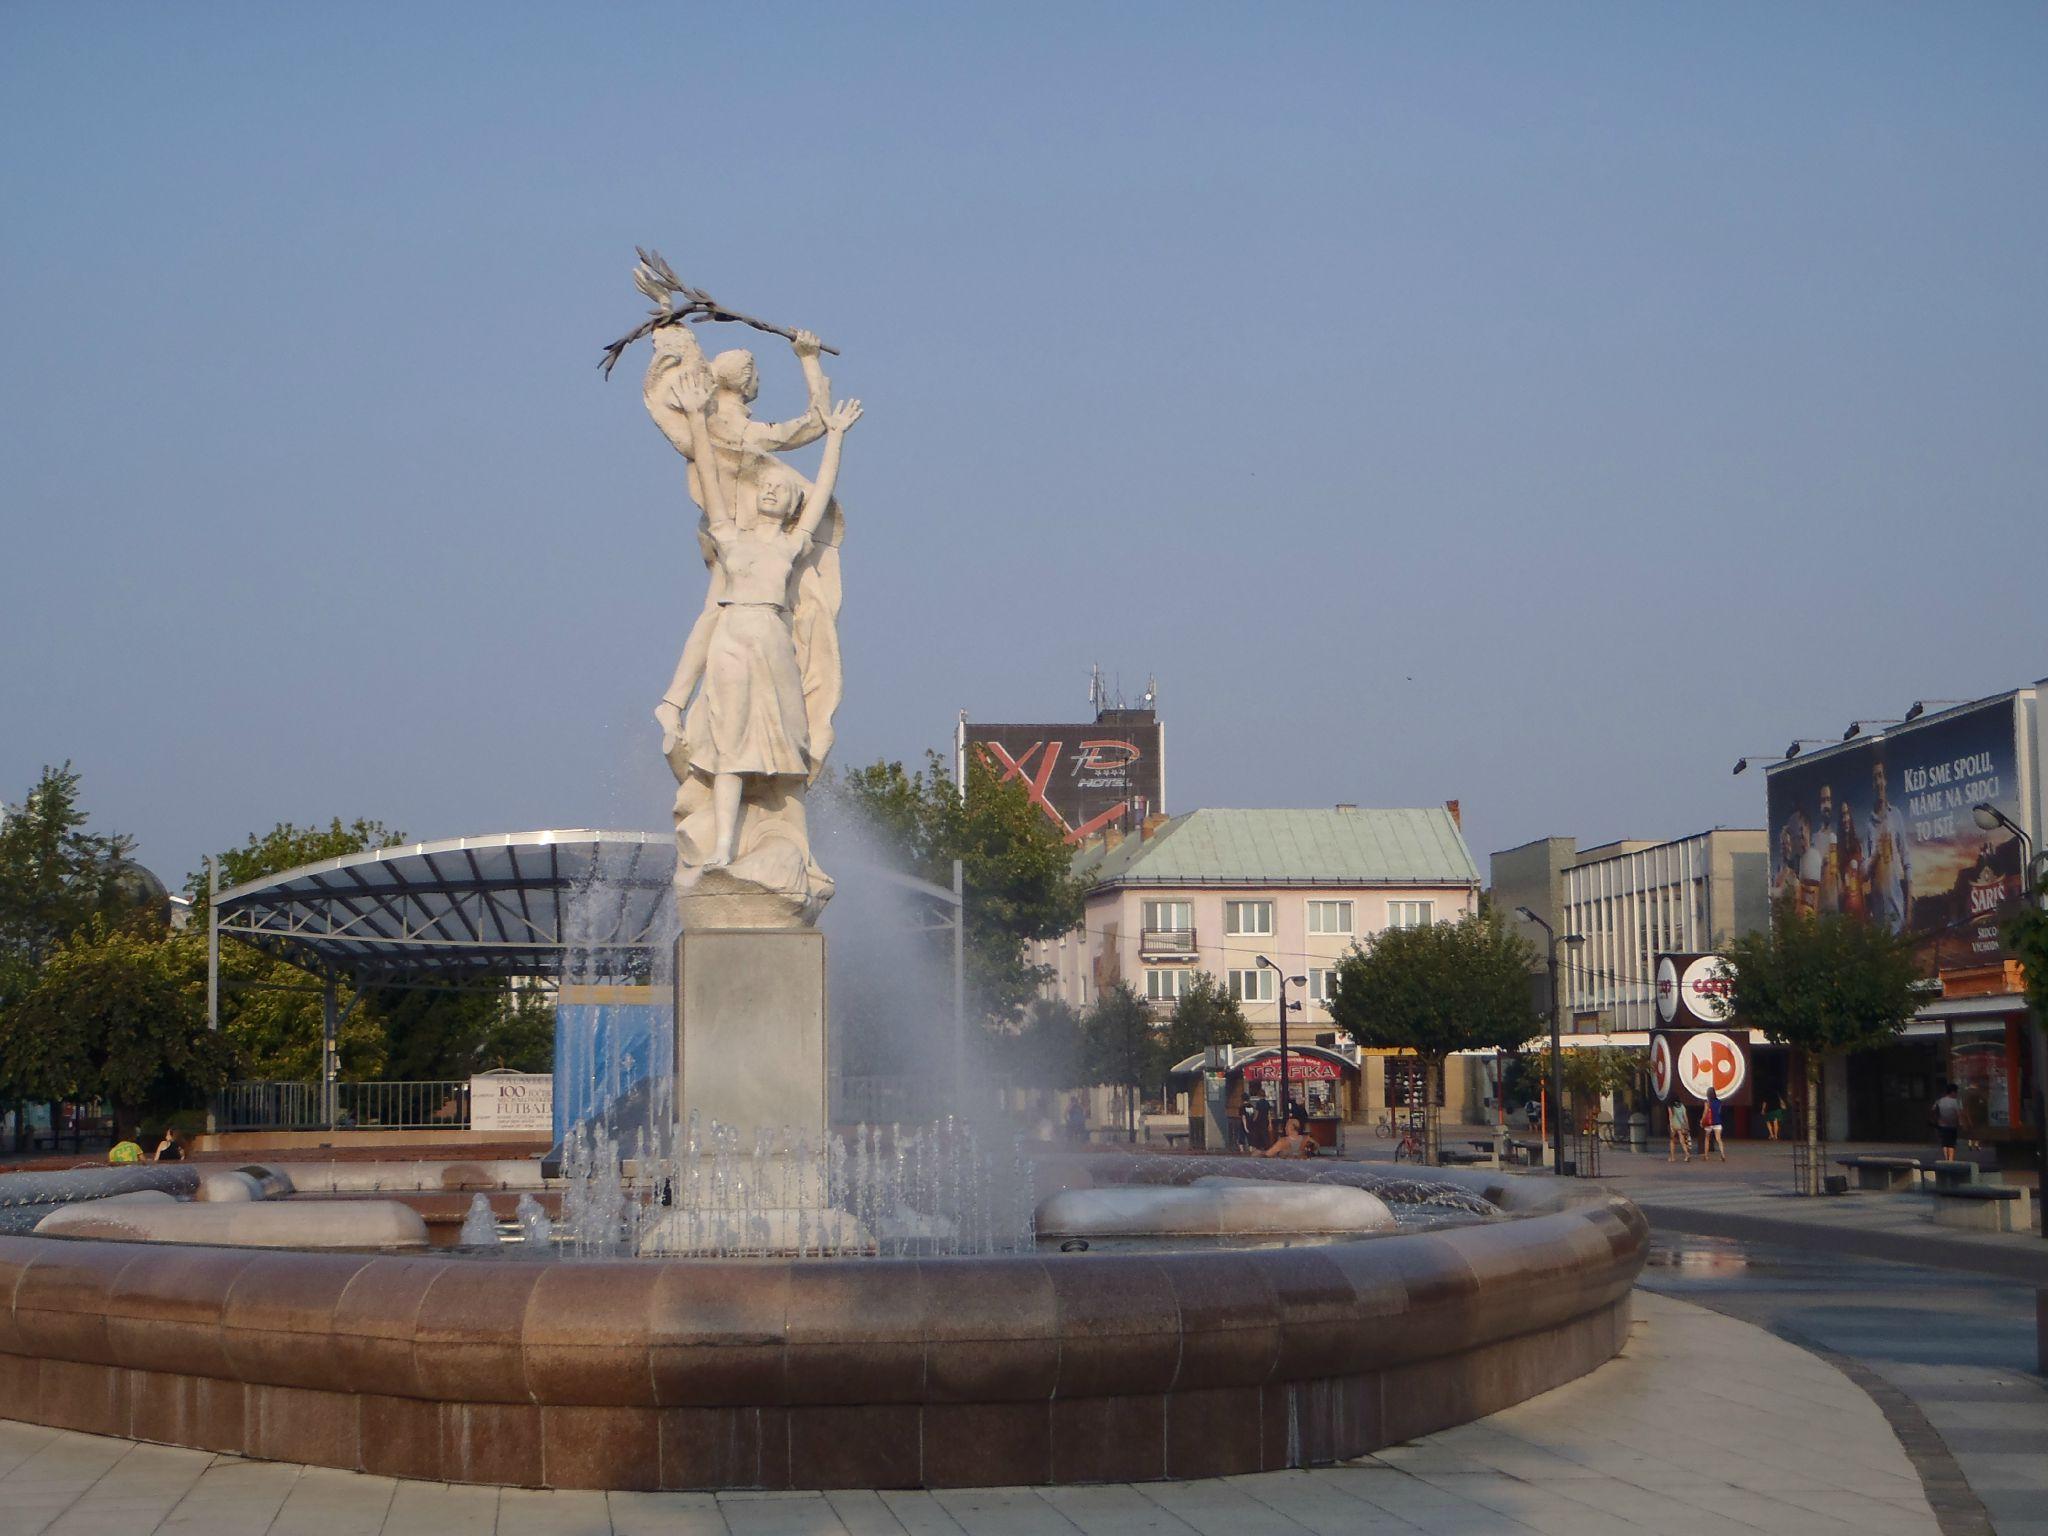 slovaquie - michalov fontaine influence soviet